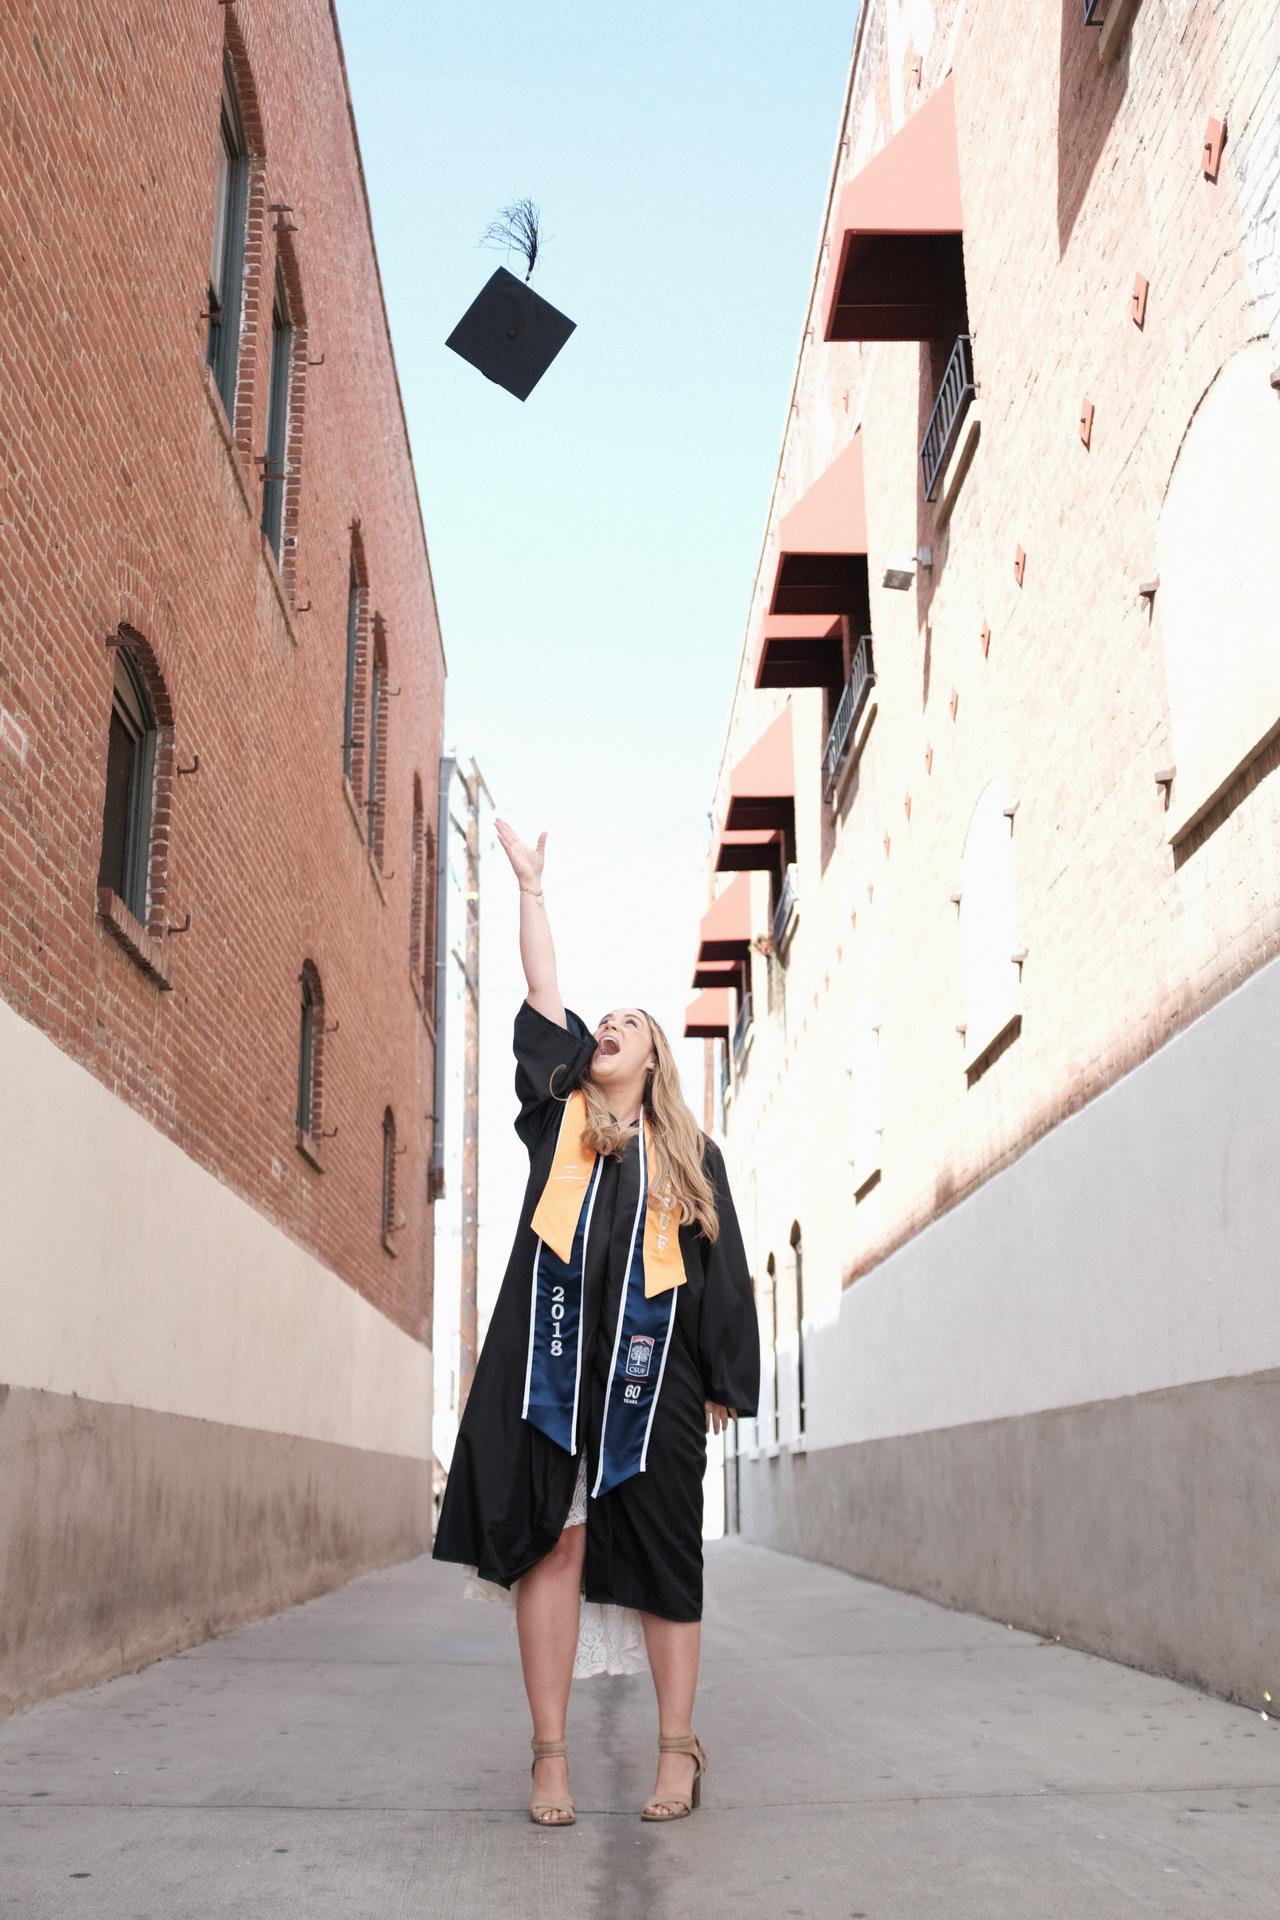 graduation photos orange county by nicole caldwell studio 13